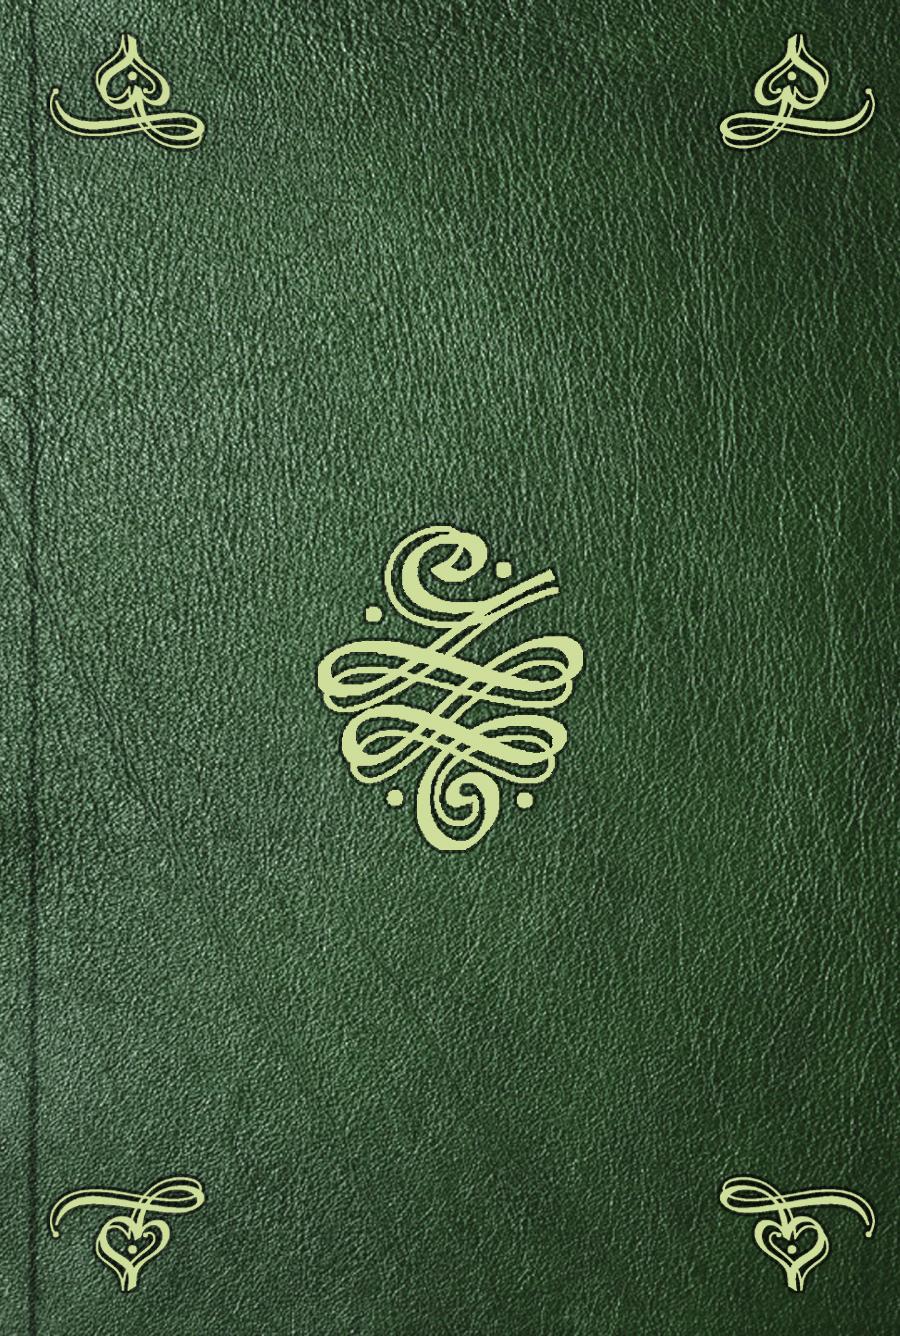 Фото - Рене Декарт Oeuvres de Descartes. T. 9 декарт рене декарт собрание сочинений